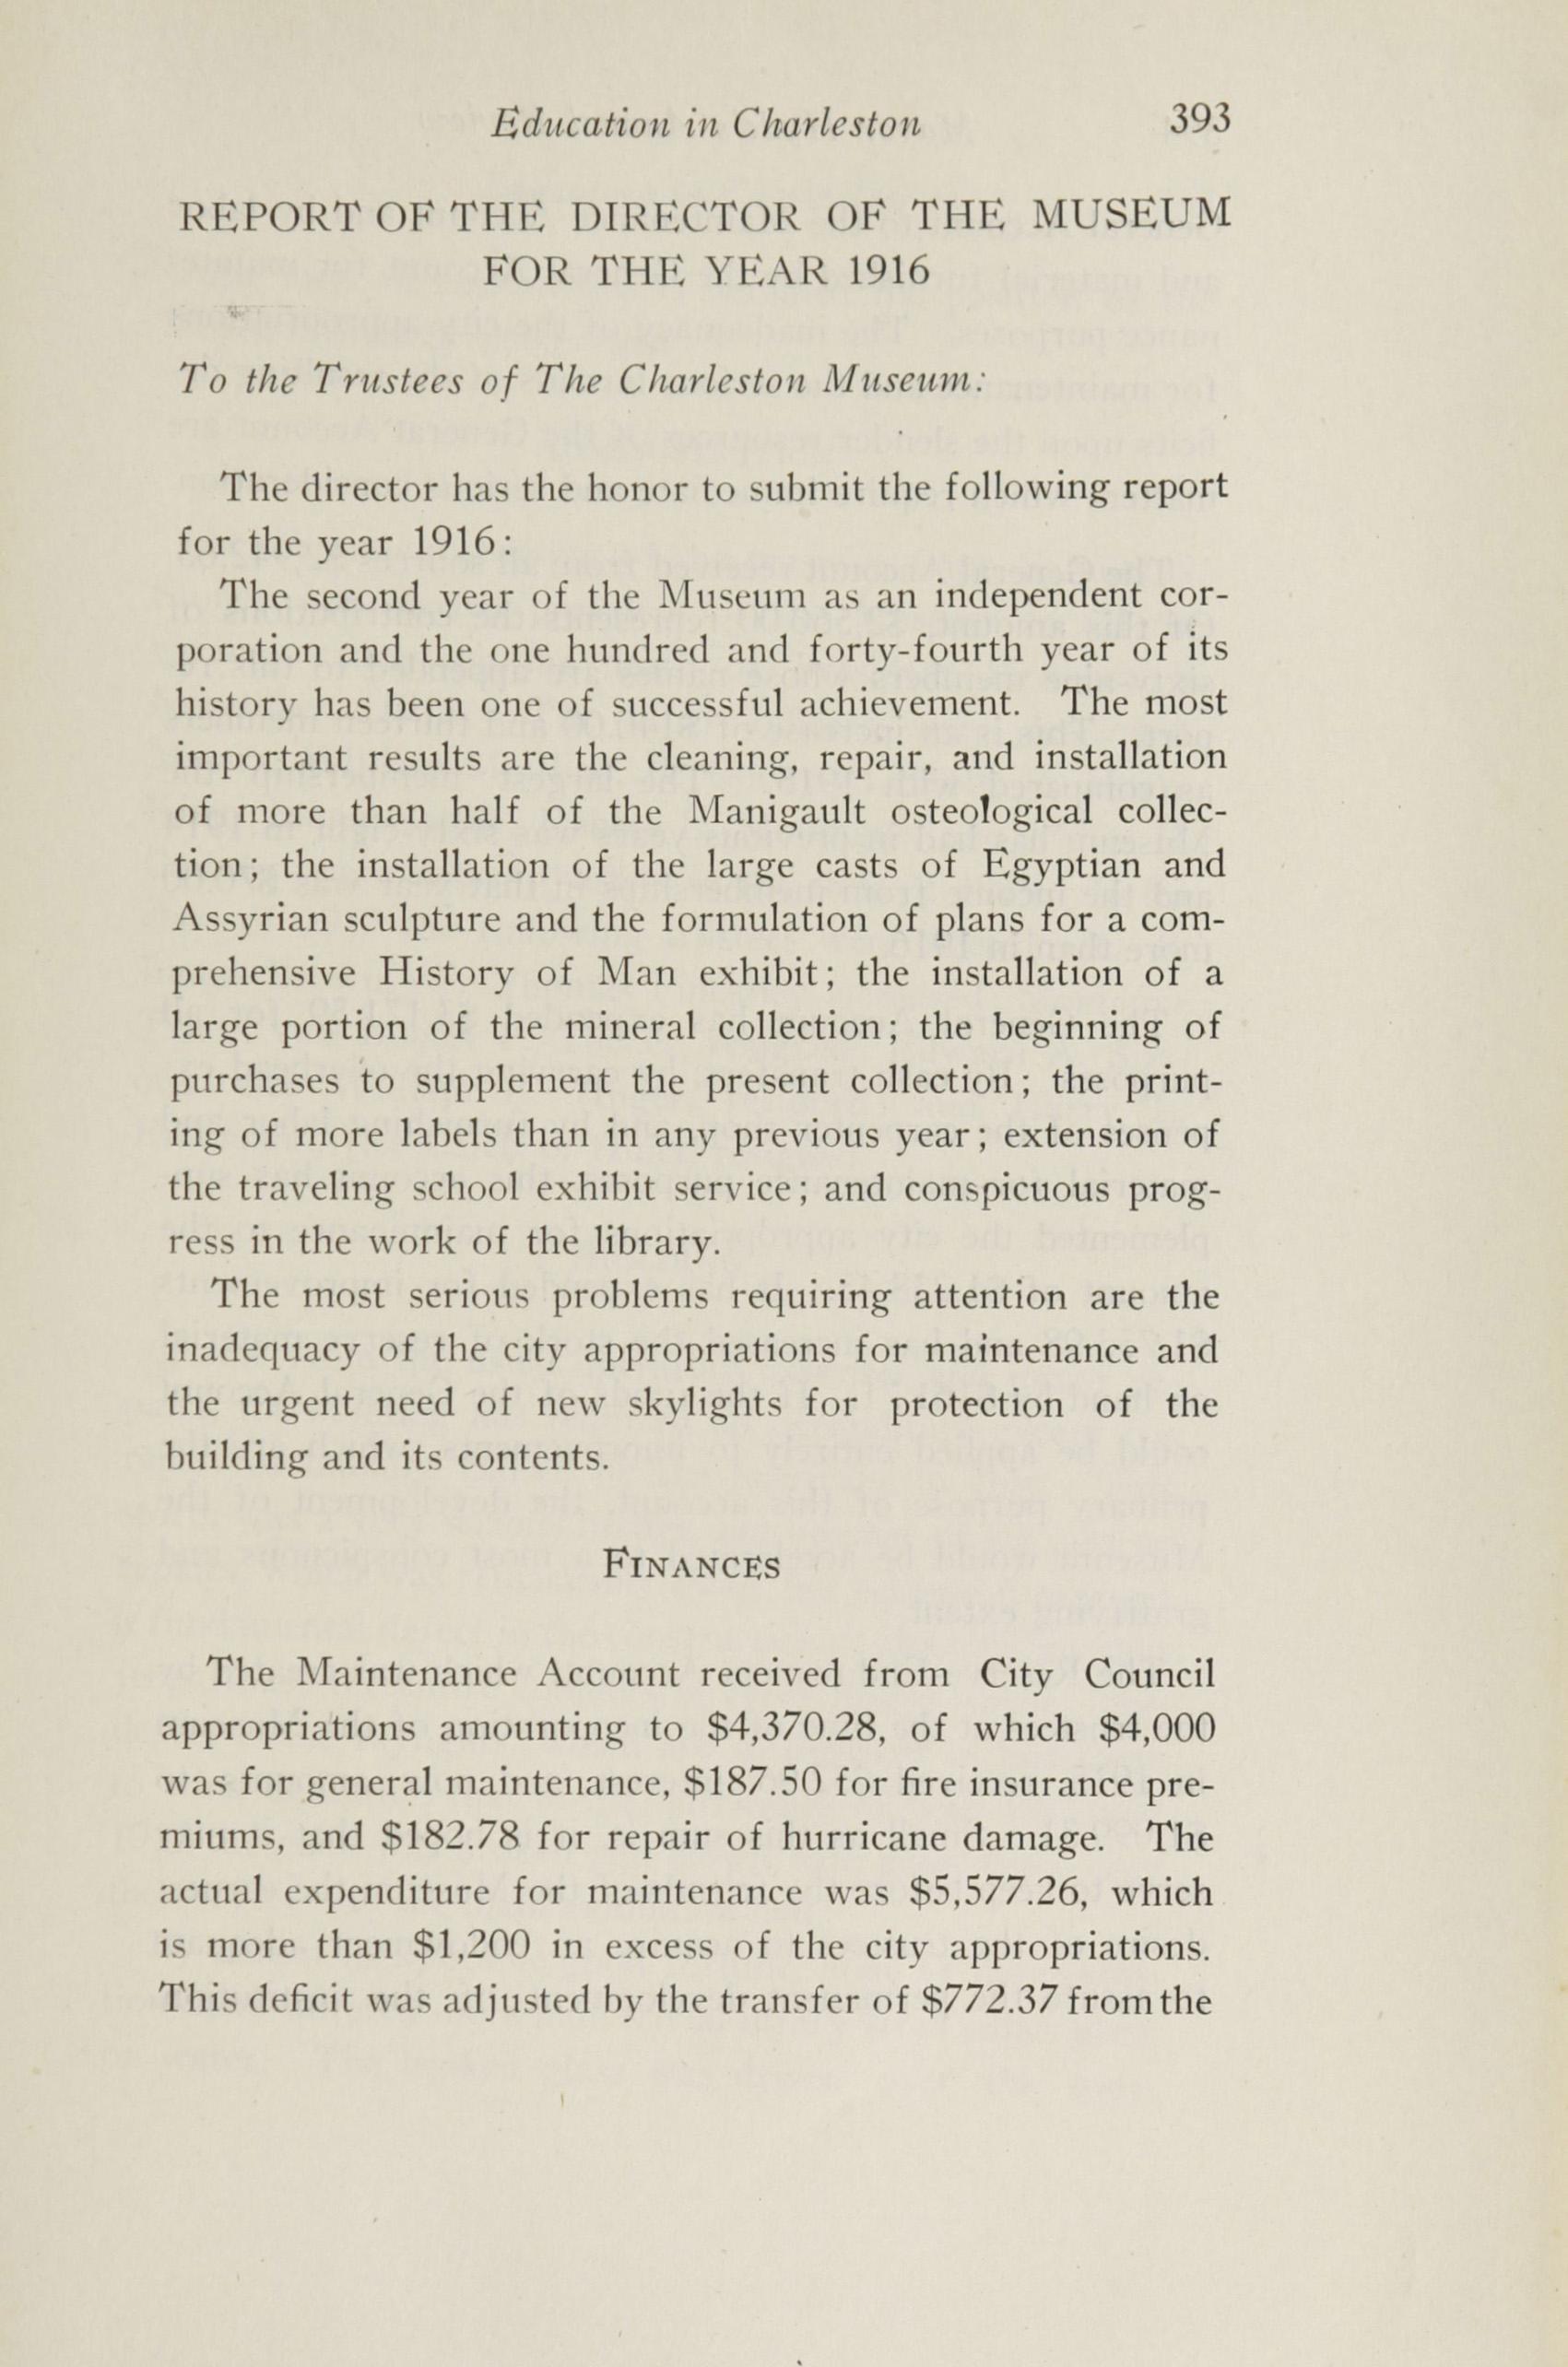 Charleston Yearbook, 1916, page 393